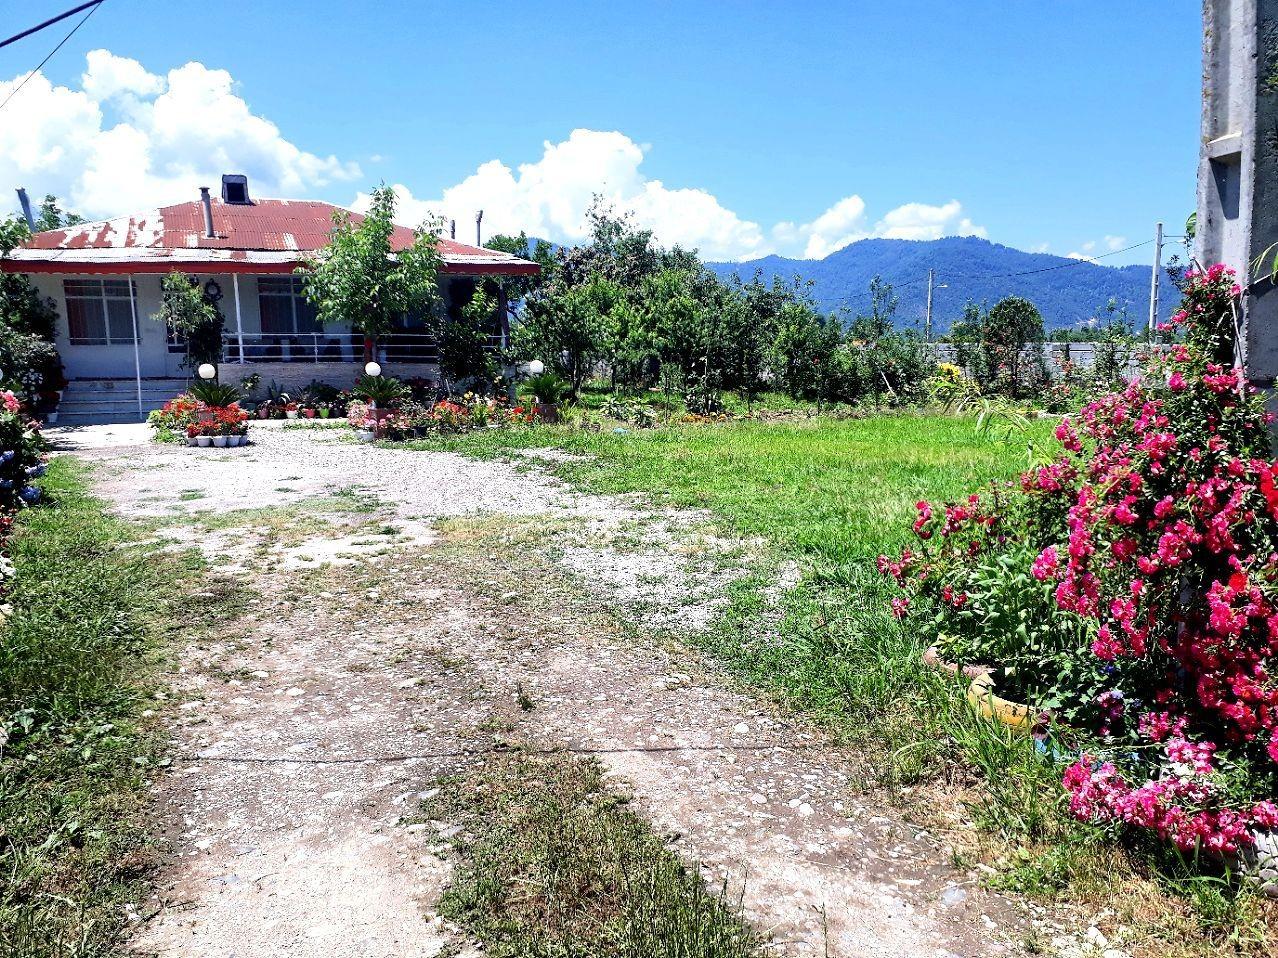 Village اجاره ویلا در ماسال